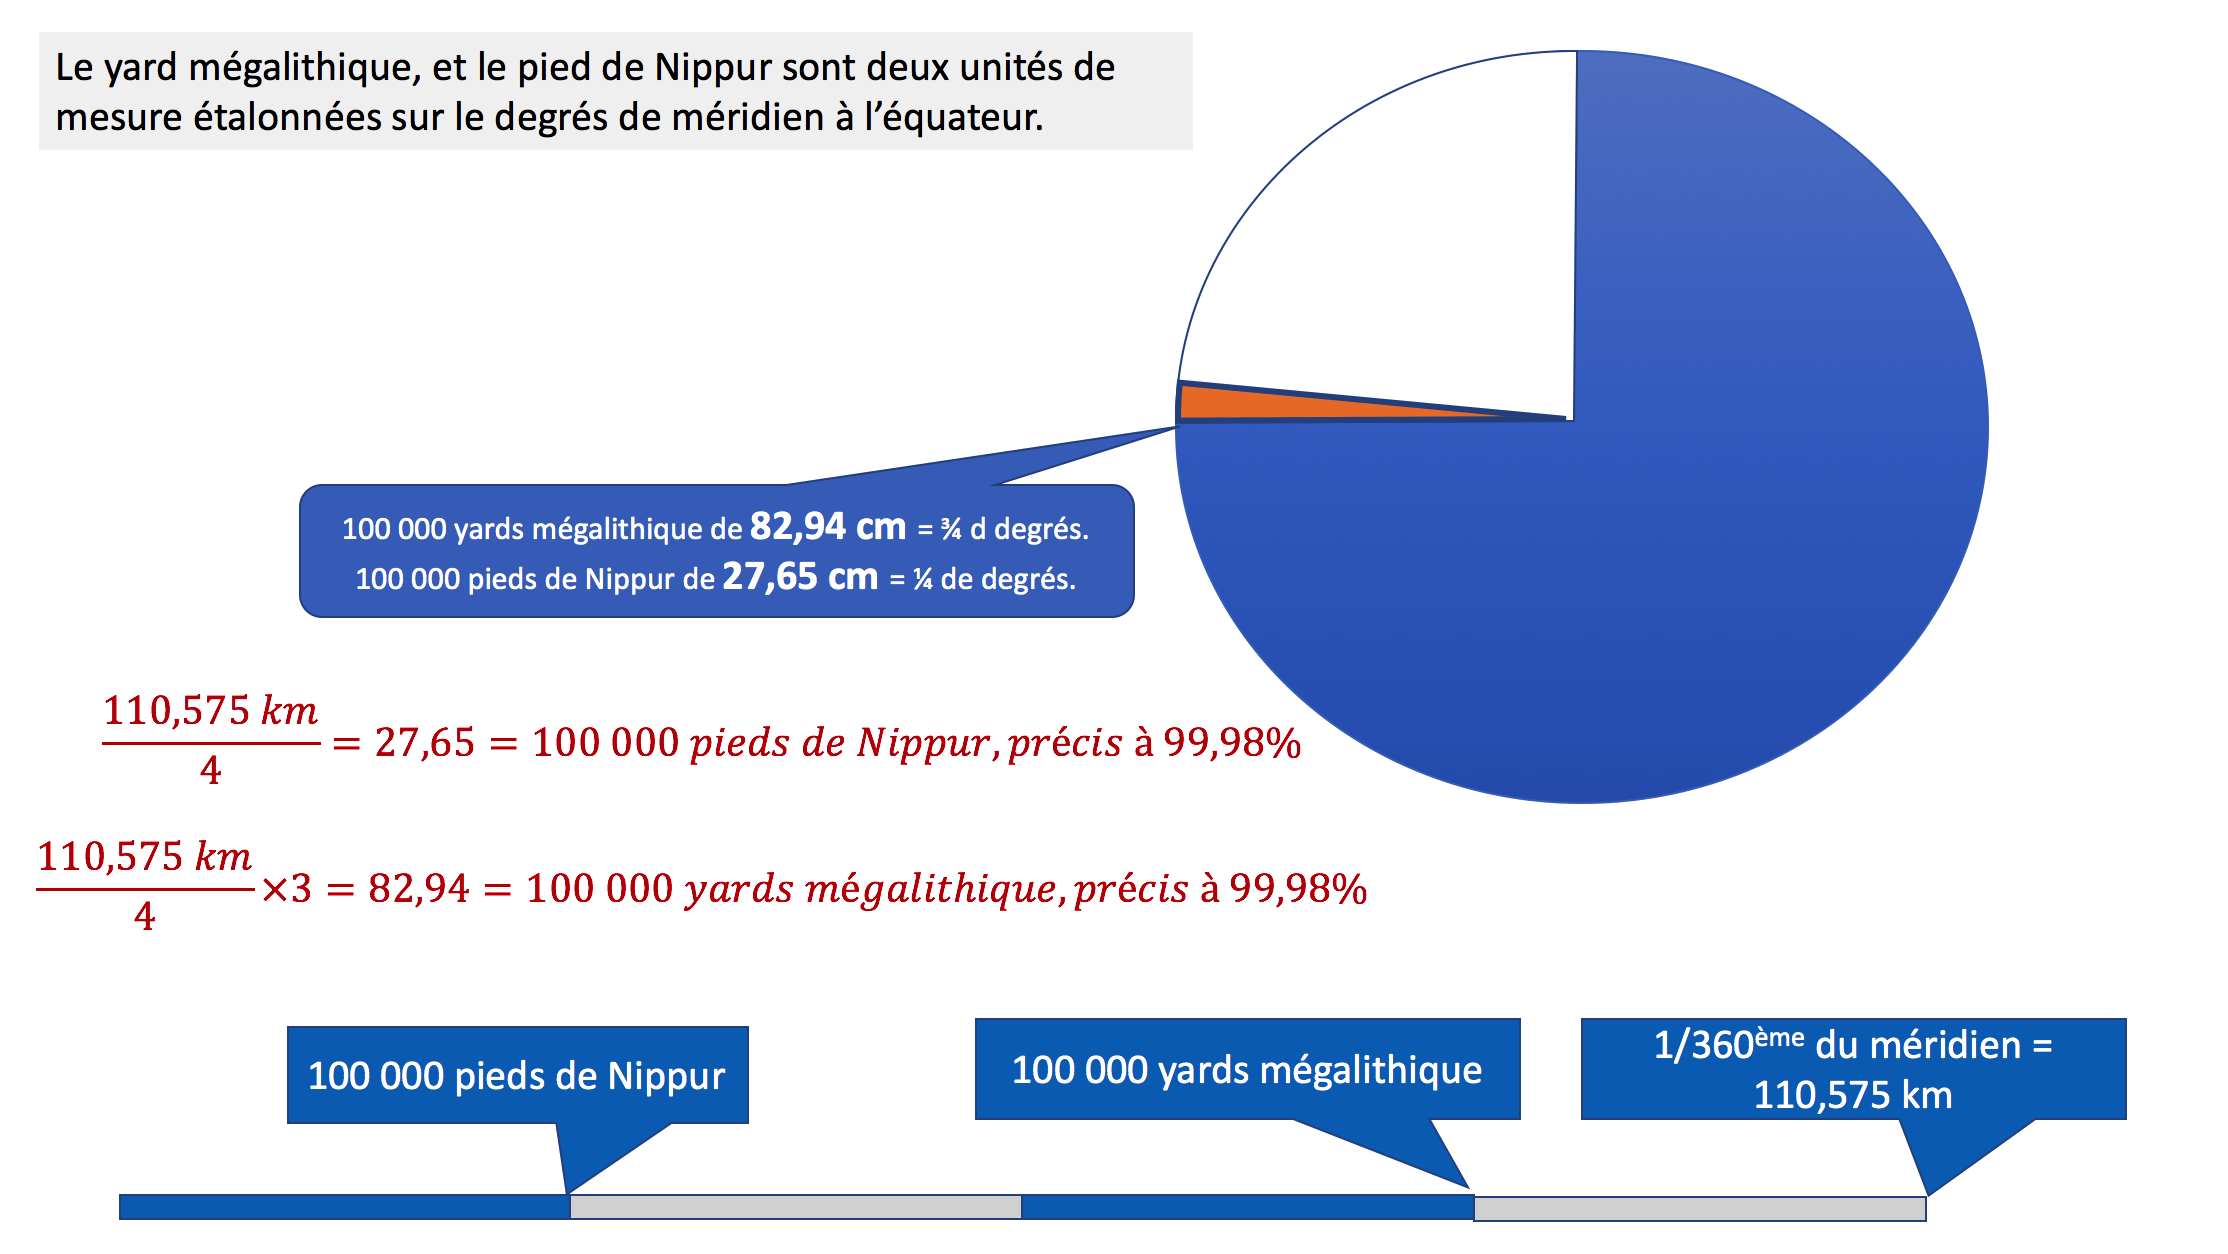 2017-10-18 21:50:48